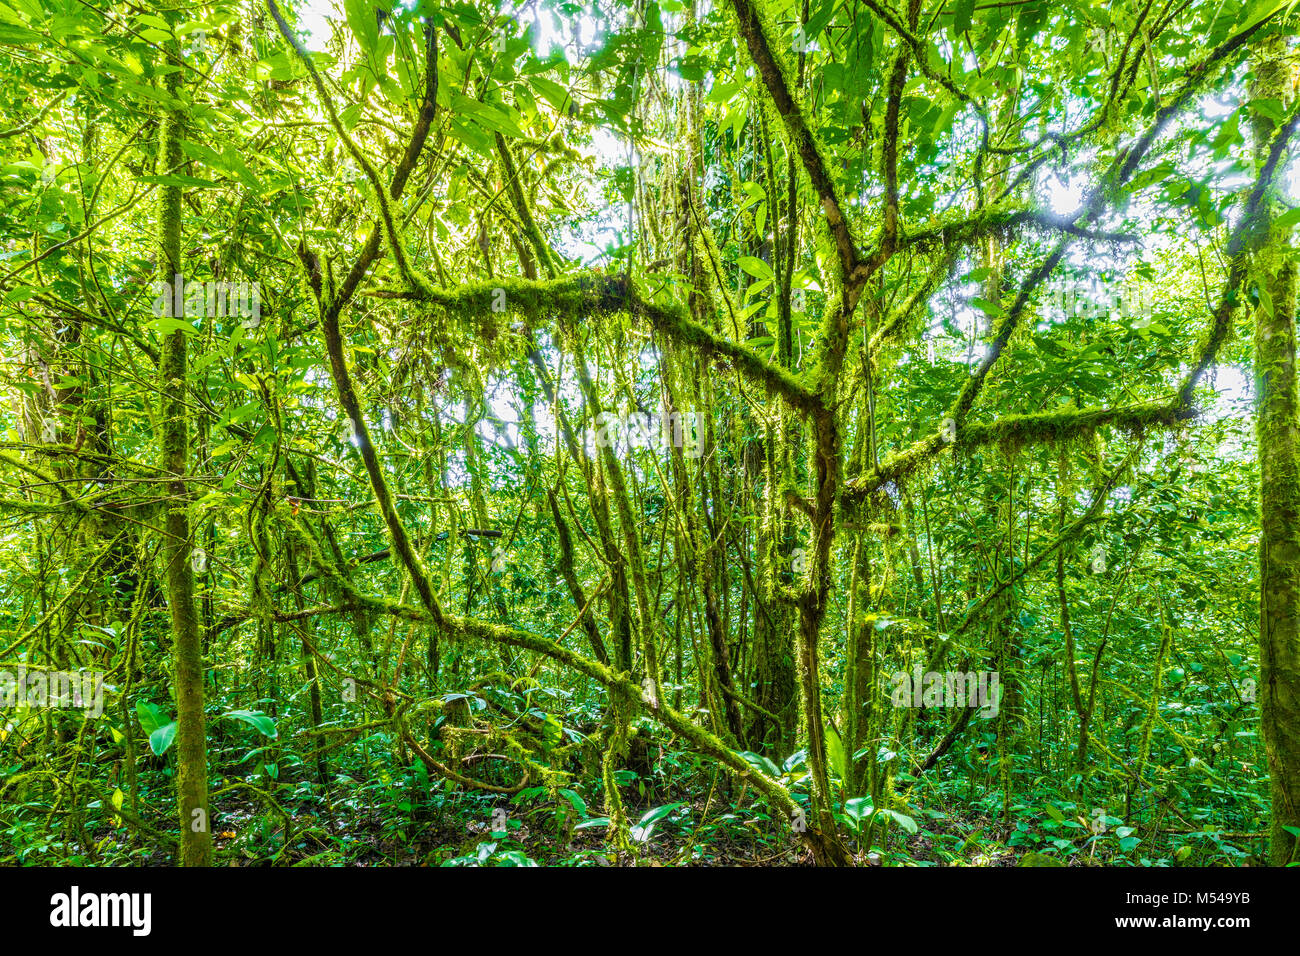 jungle lianas in panama - Stock Image